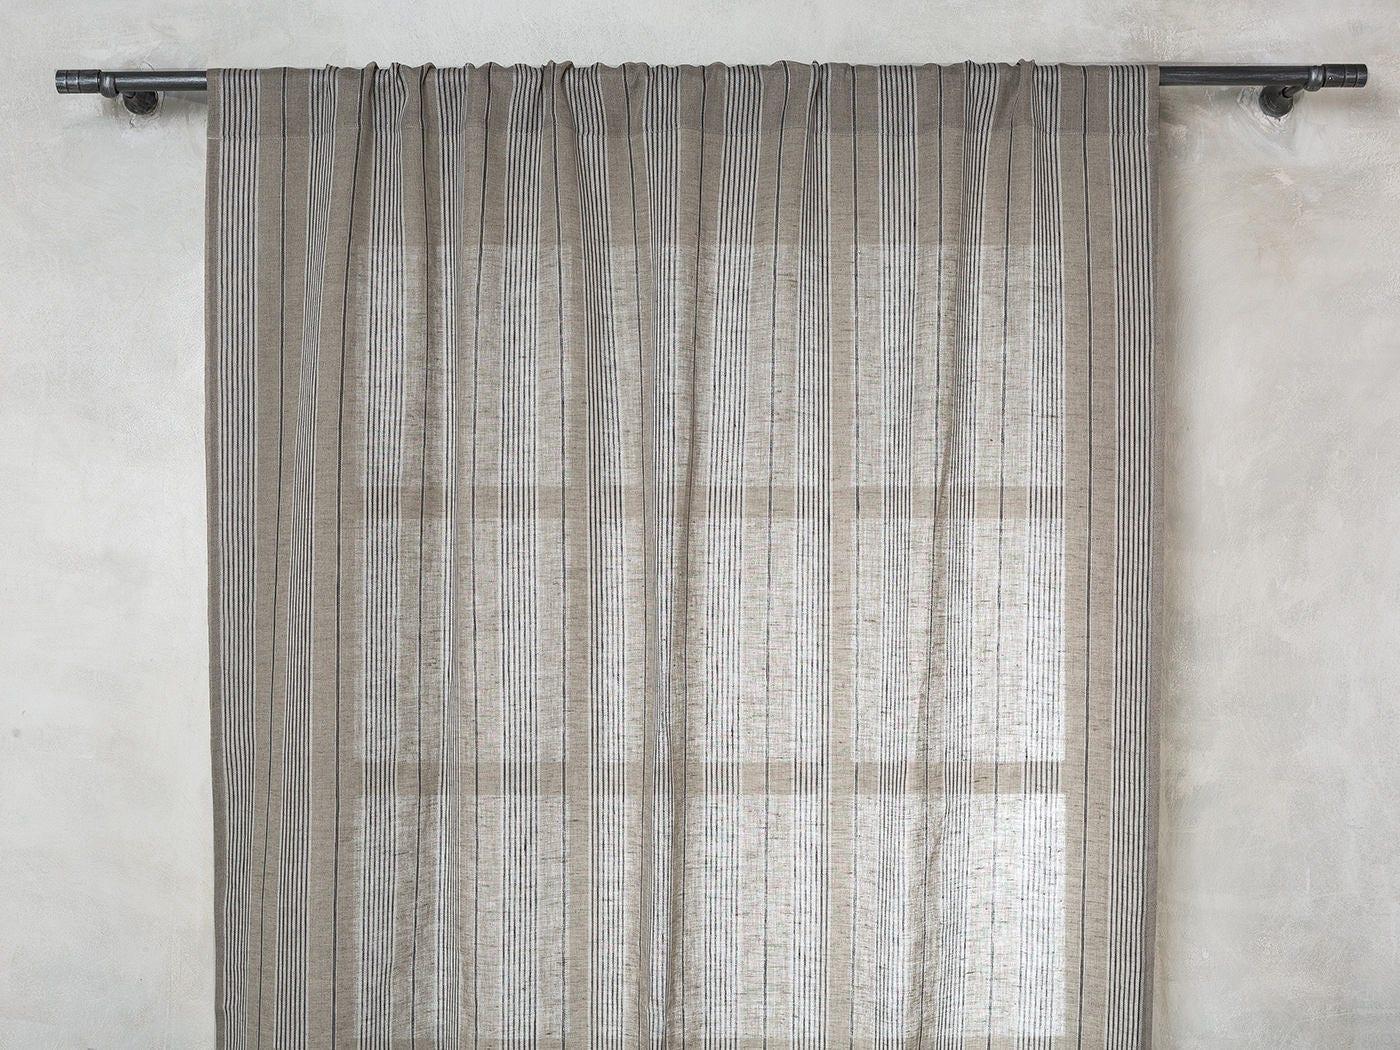 Linen Curtain-Linen Drapes- Curtains-Striped Linen Curtain